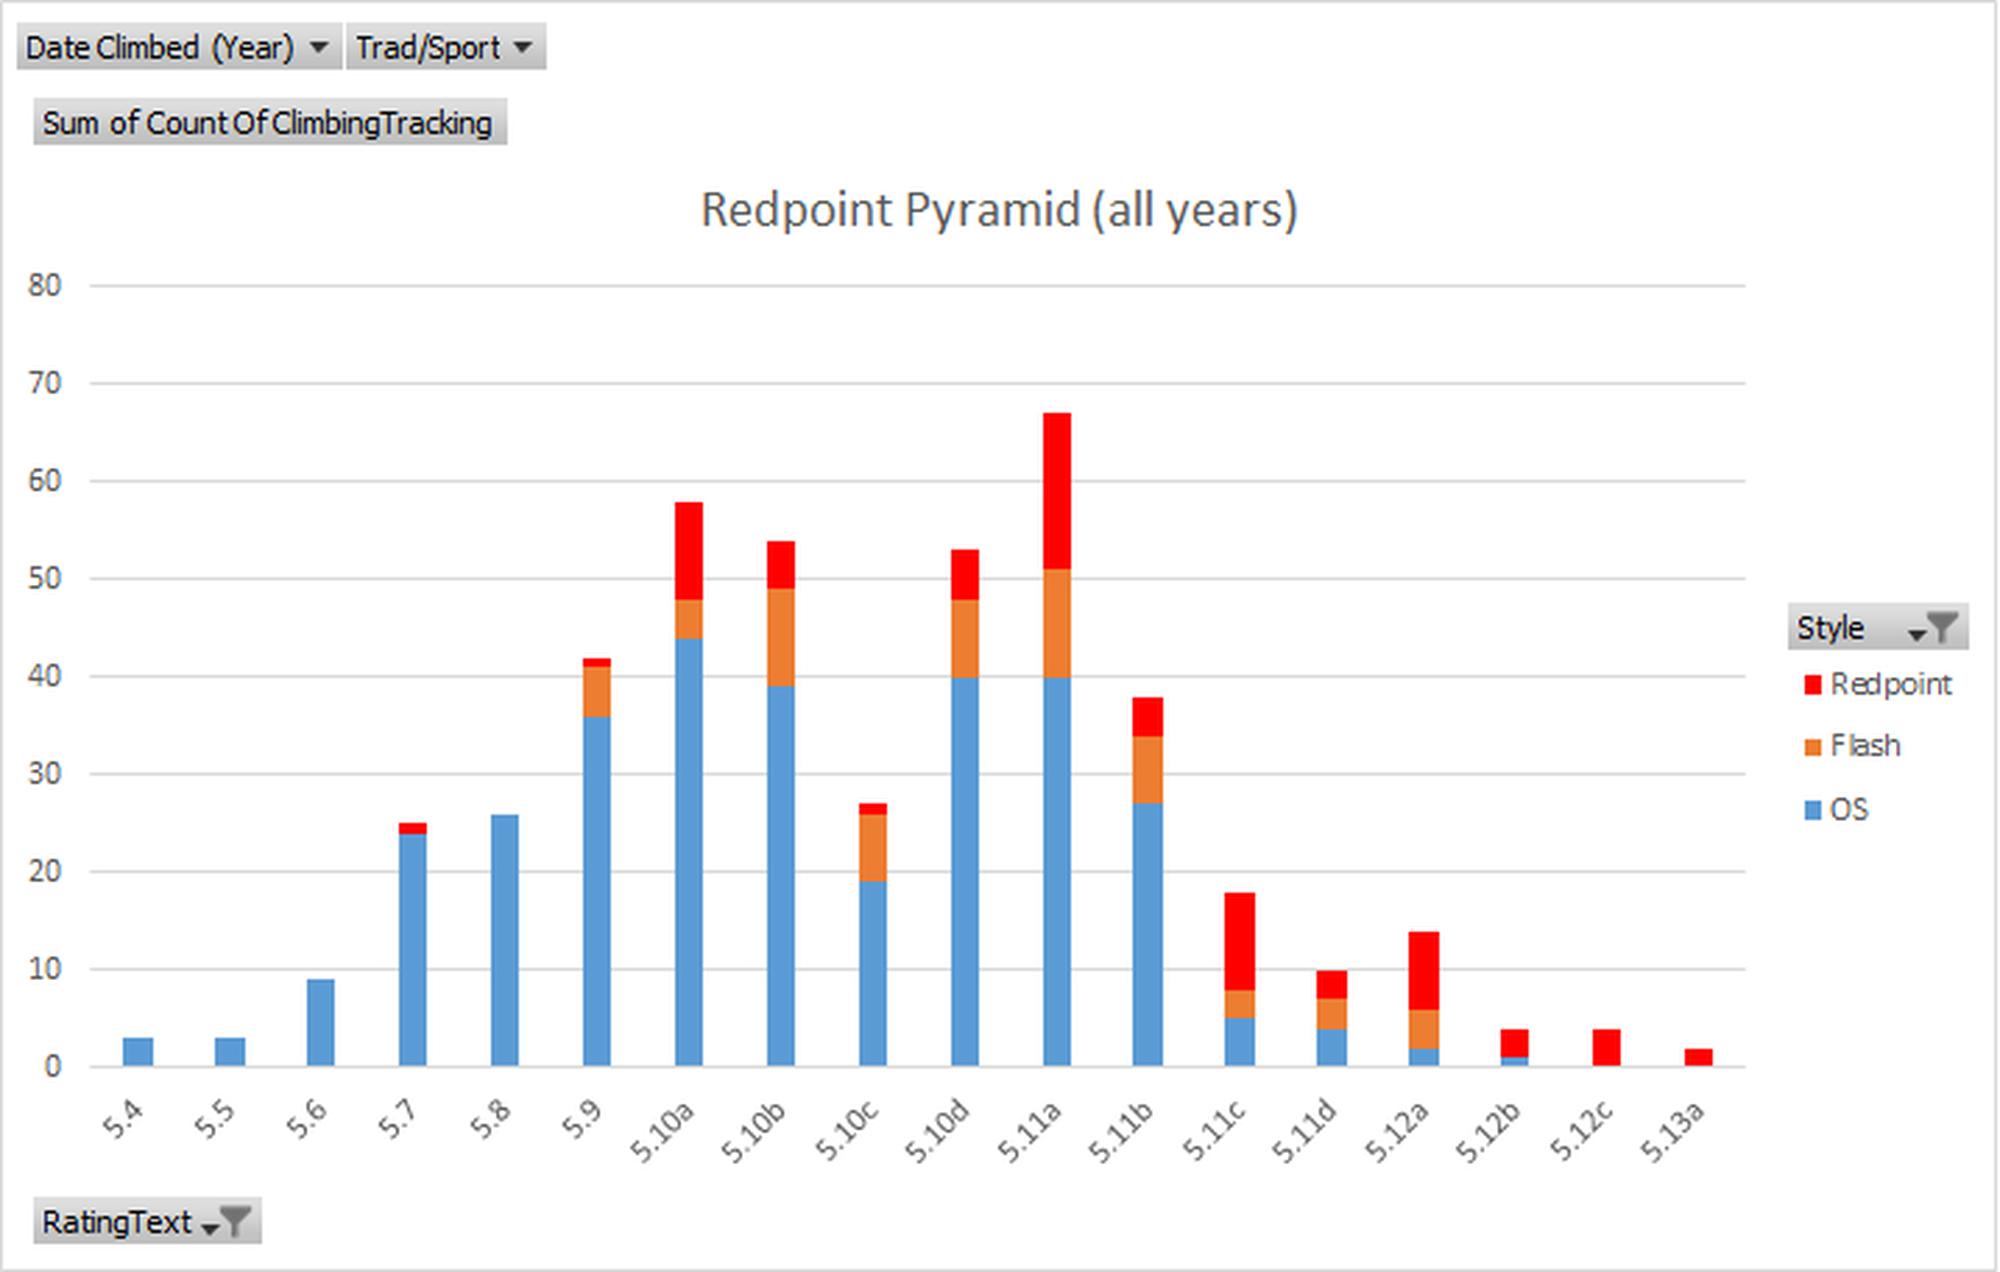 Redpoint pyramid, May 2020